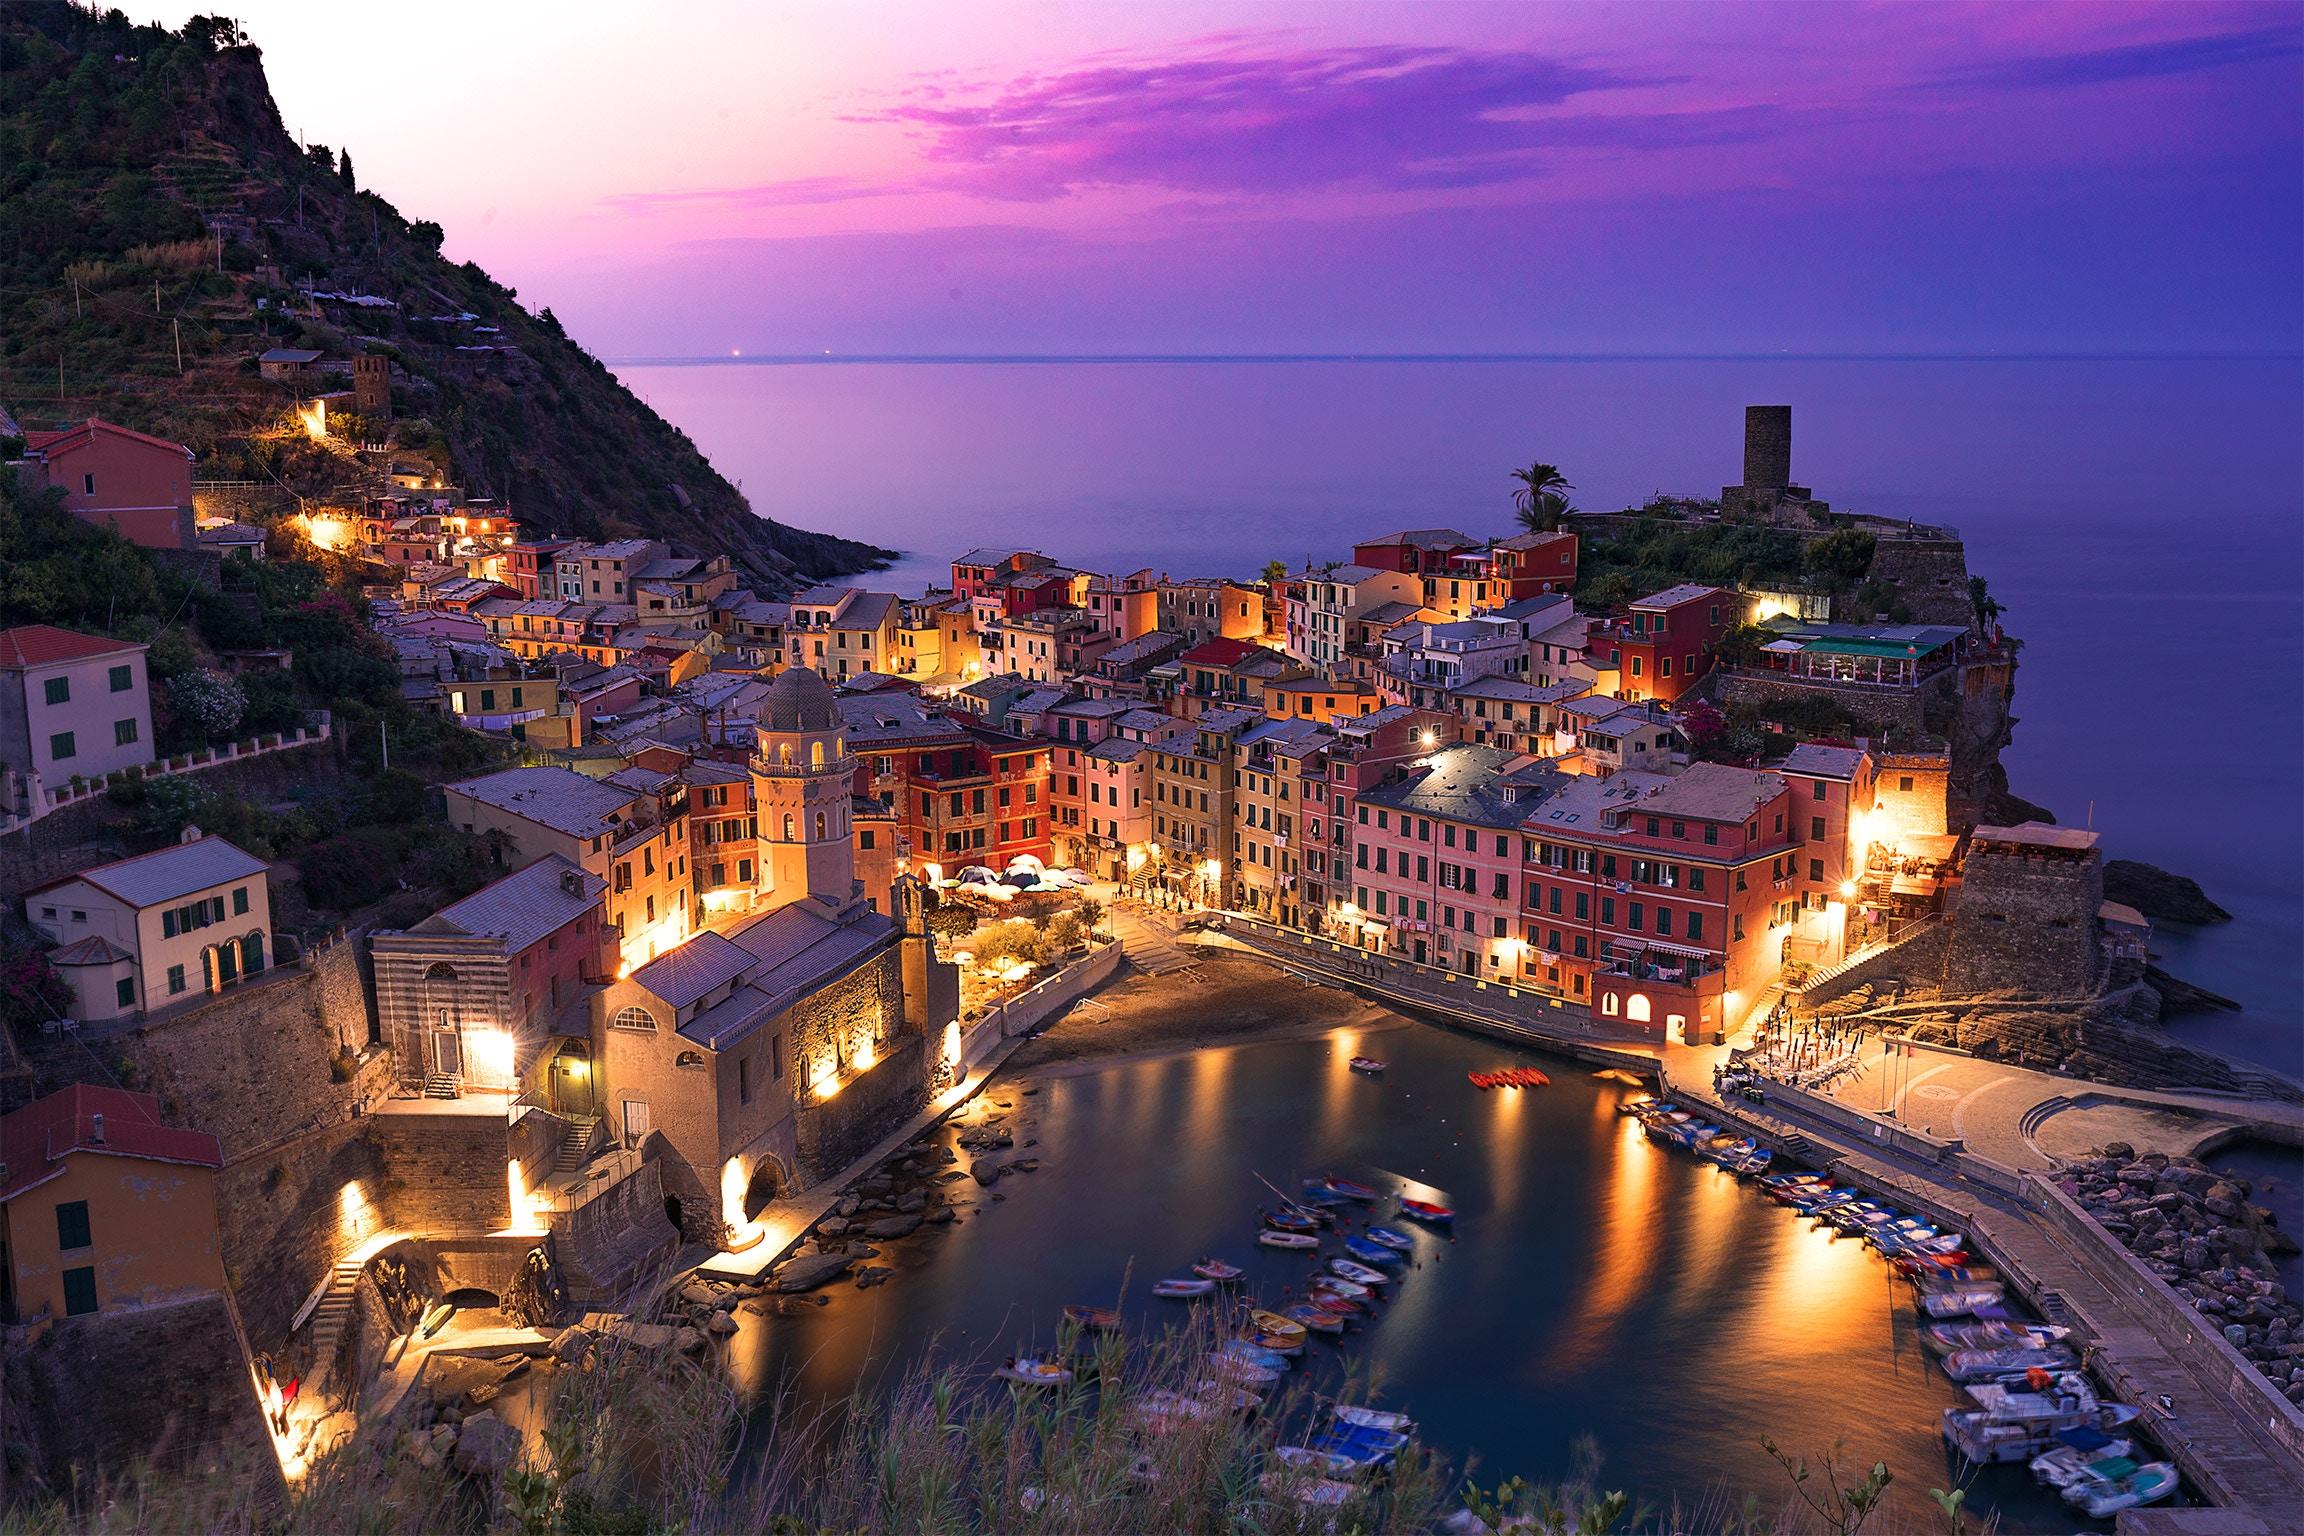 ITALIE - VERNAZZA